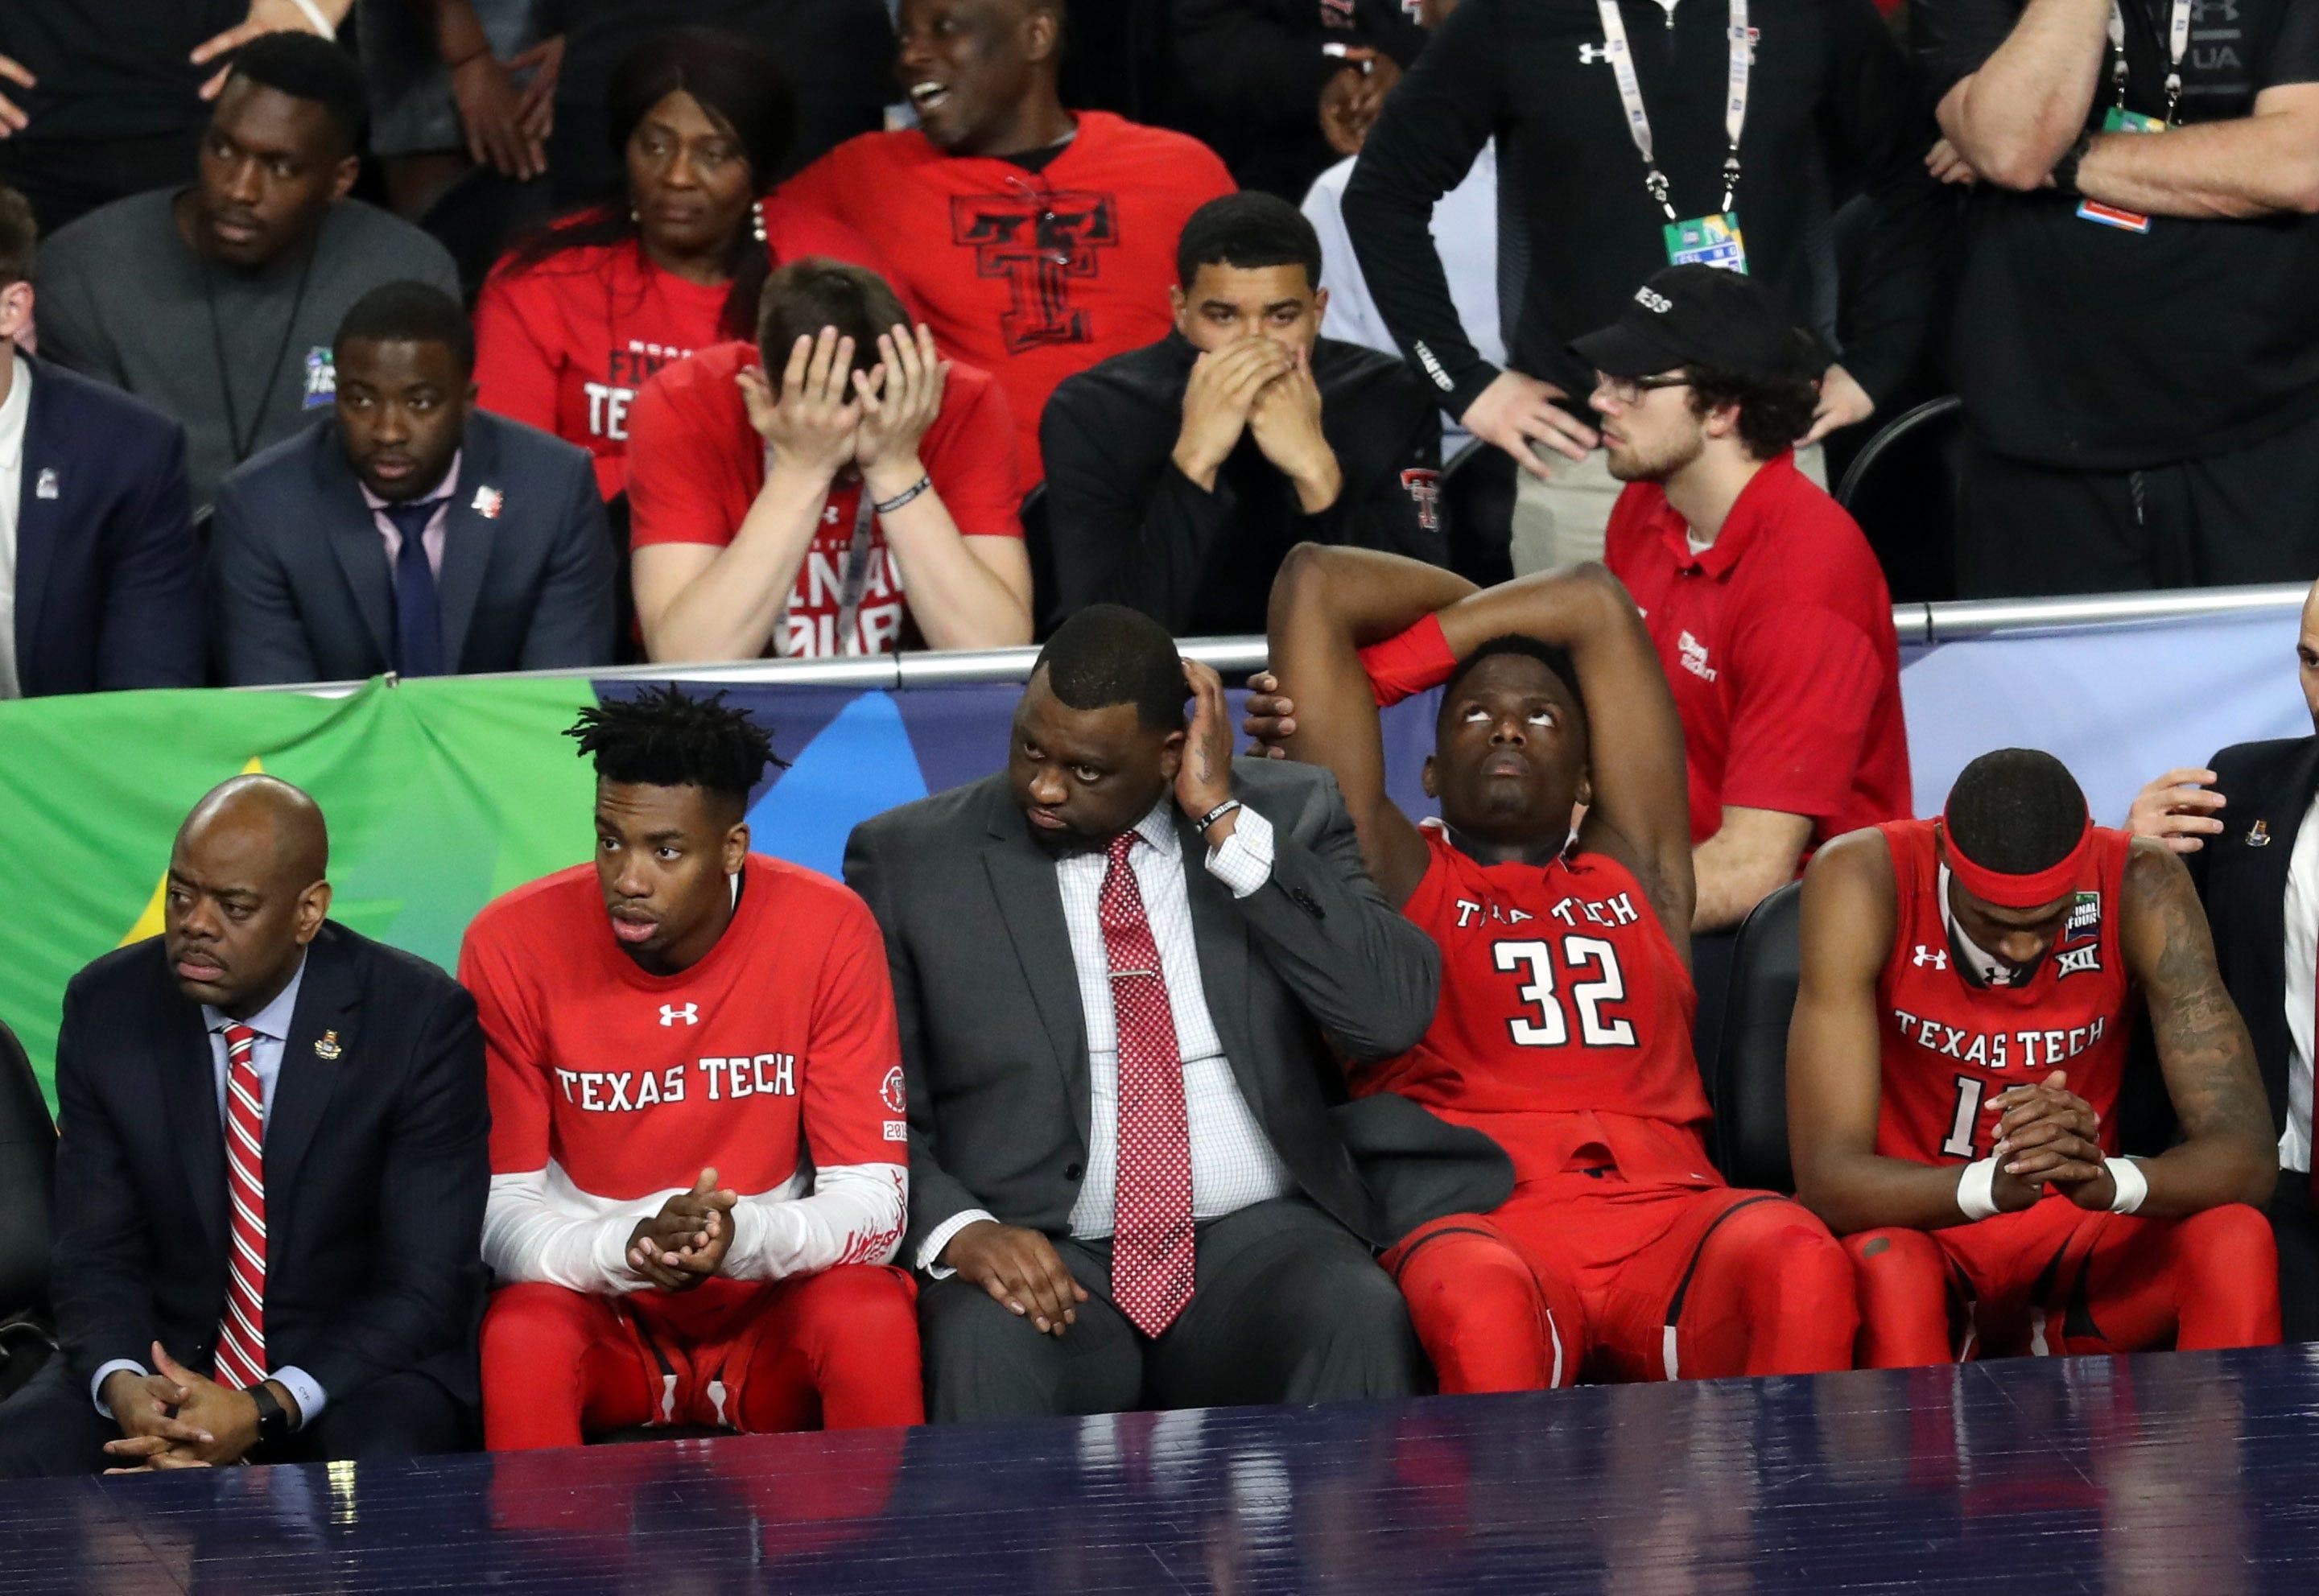 NCAA championship: See Patrick Mahomes' faux Adidas, Texas Tech gear